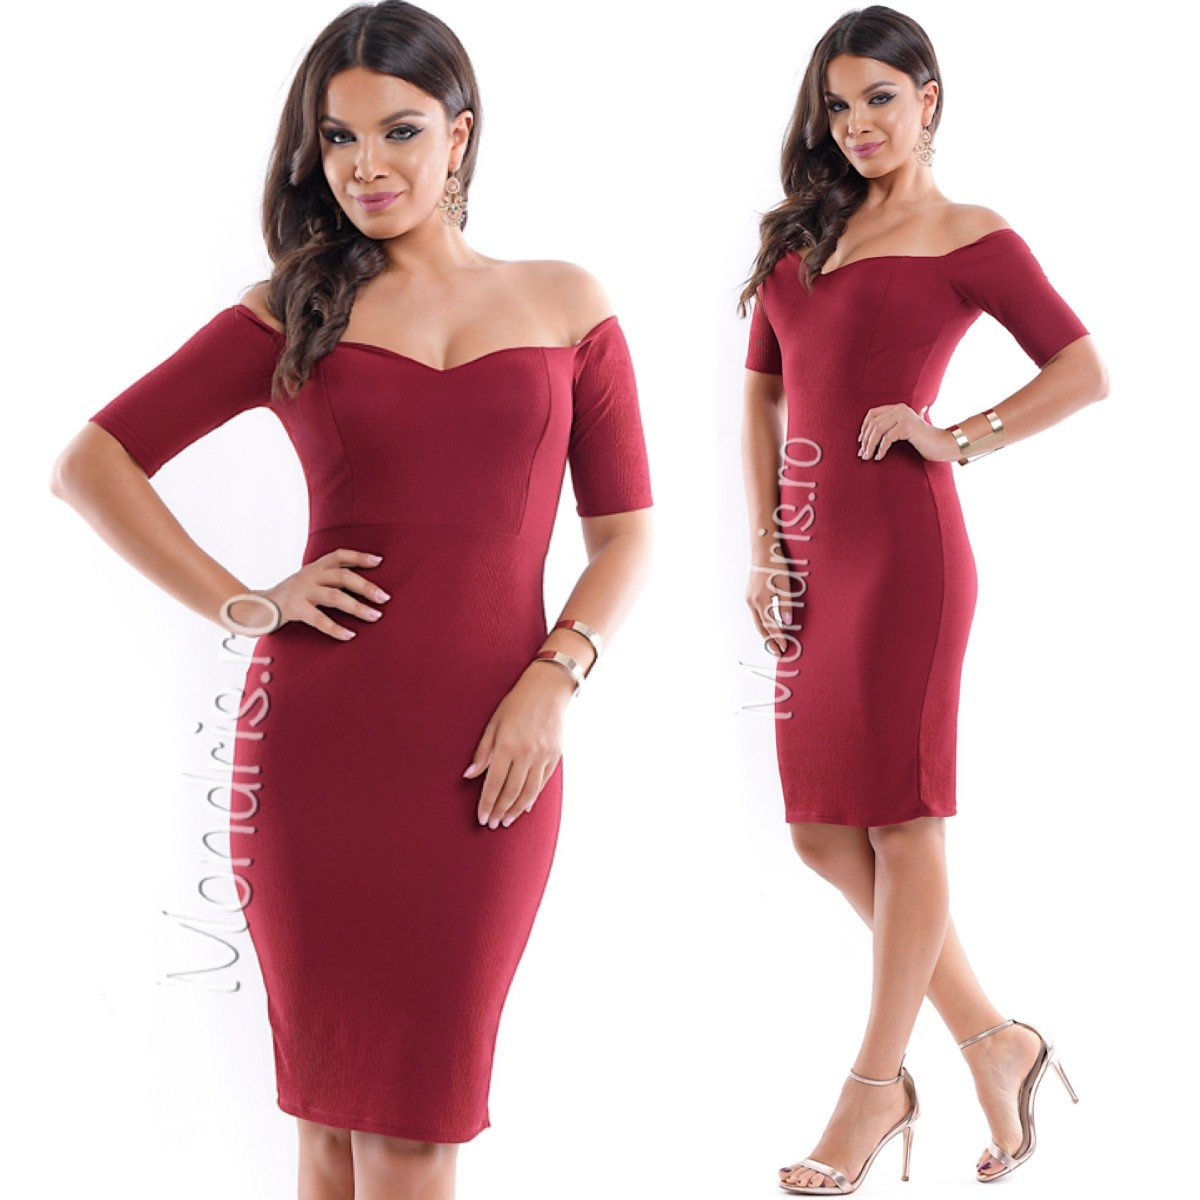 Rochie de ocazie scurta stramta rosie cu corset dantelat